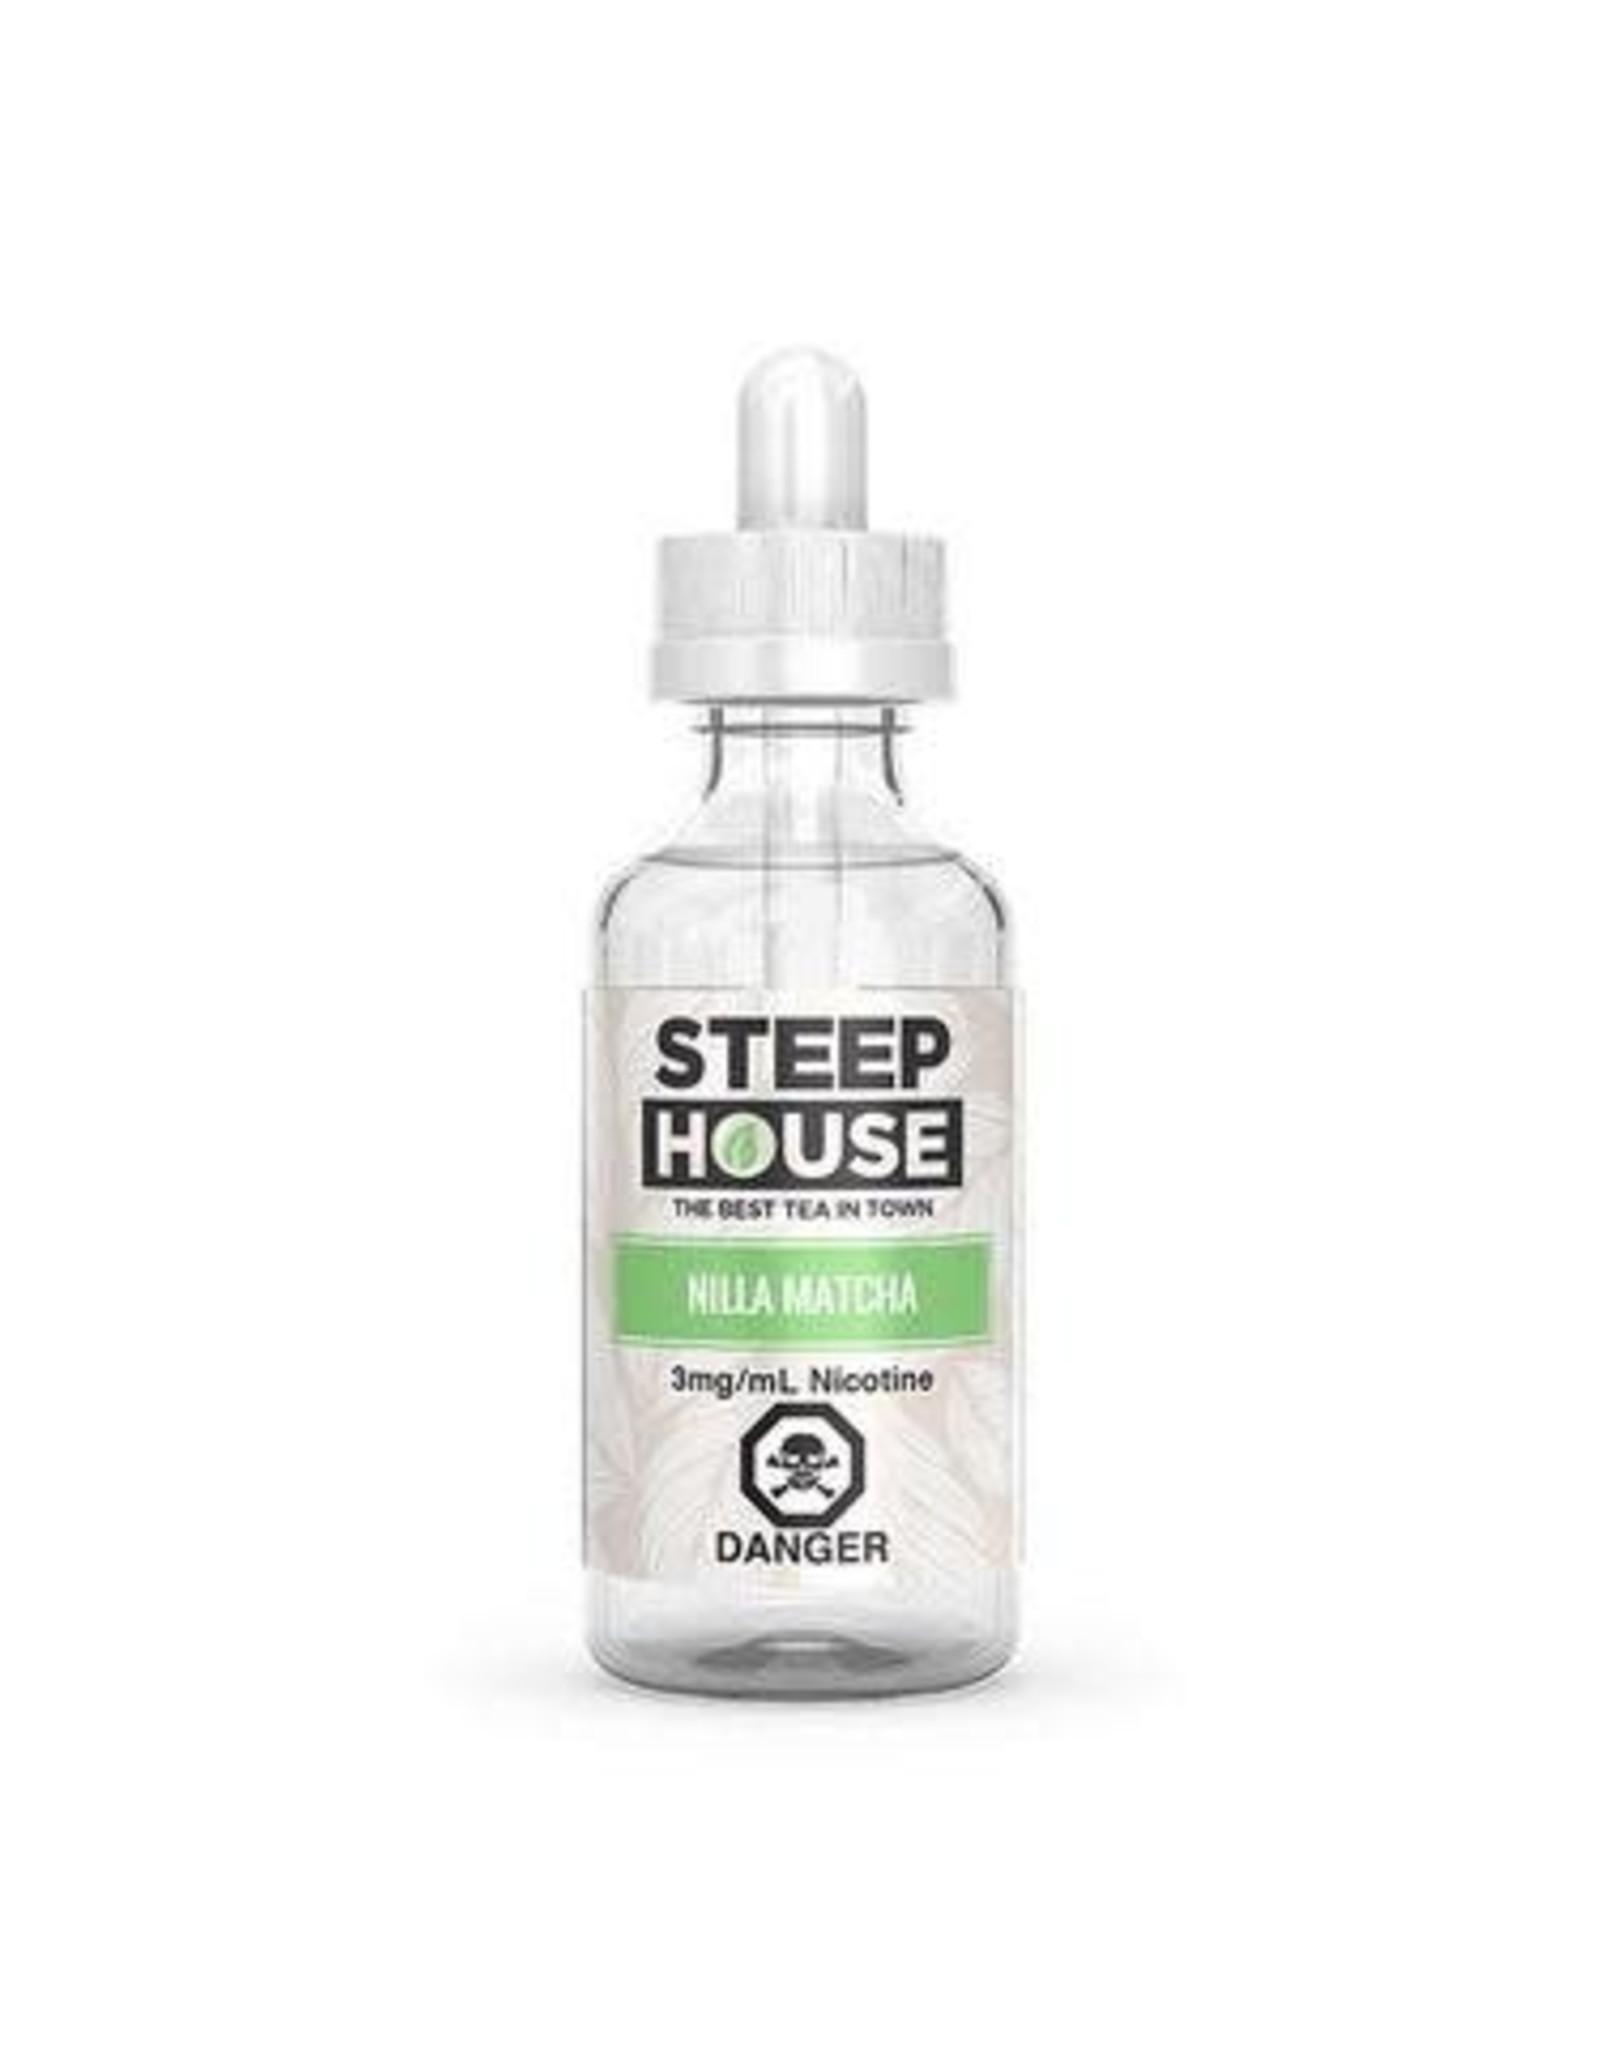 STEEP HOUSE NILLA MATCHA BY STEEP HOUSE(60ml)